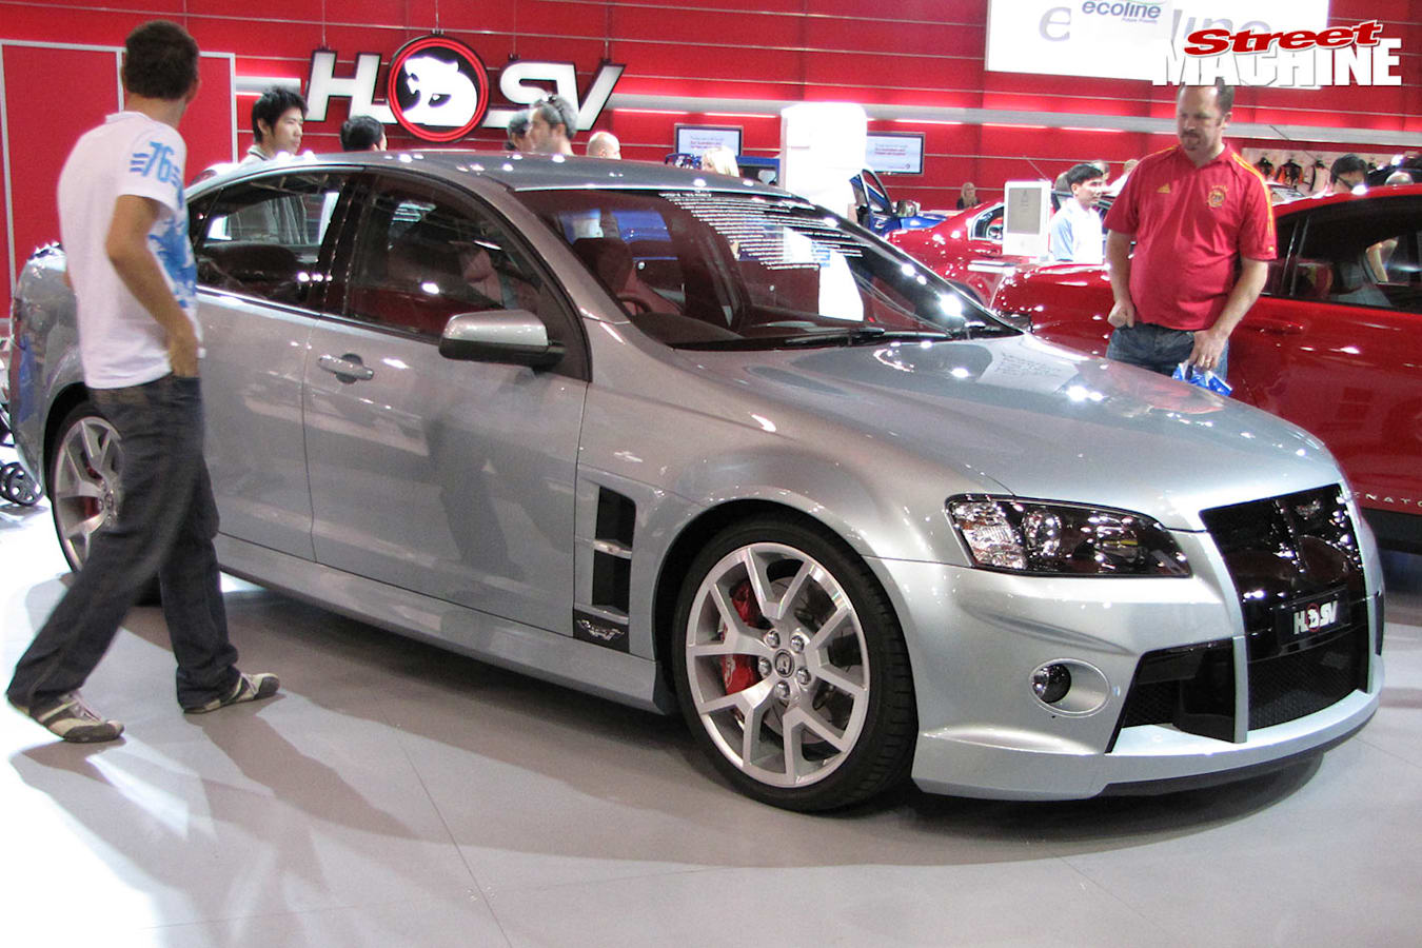 HSV W427 at the motorshow